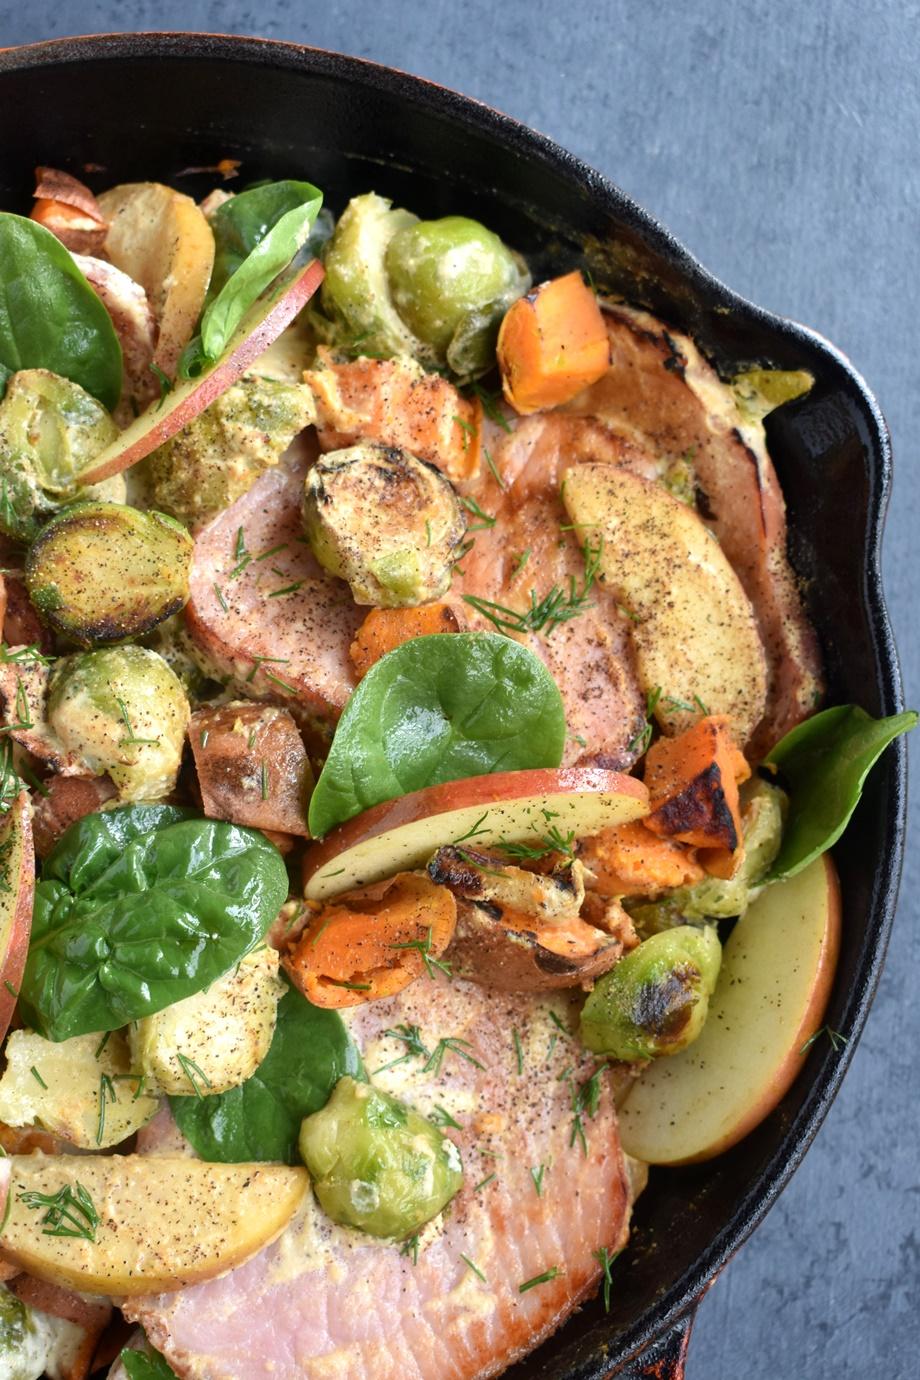 Dijon Pork Chops with Sweet Potatoes, Apples skillet